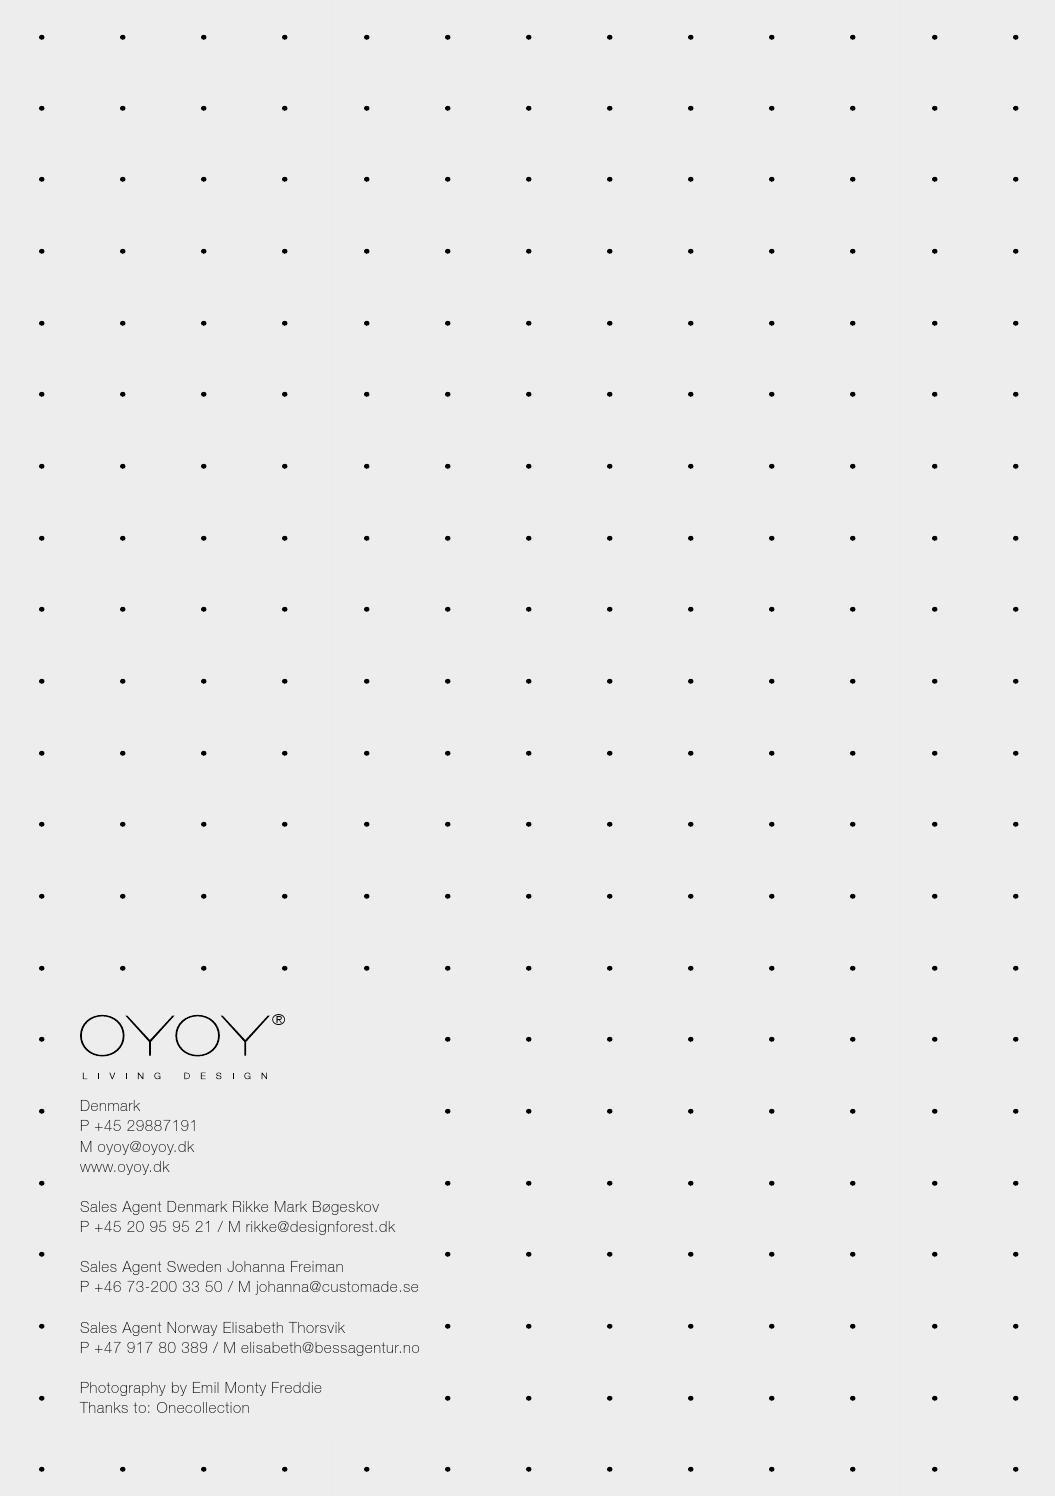 OYOY Living Design SS14 catalogue by OYOY Living Design